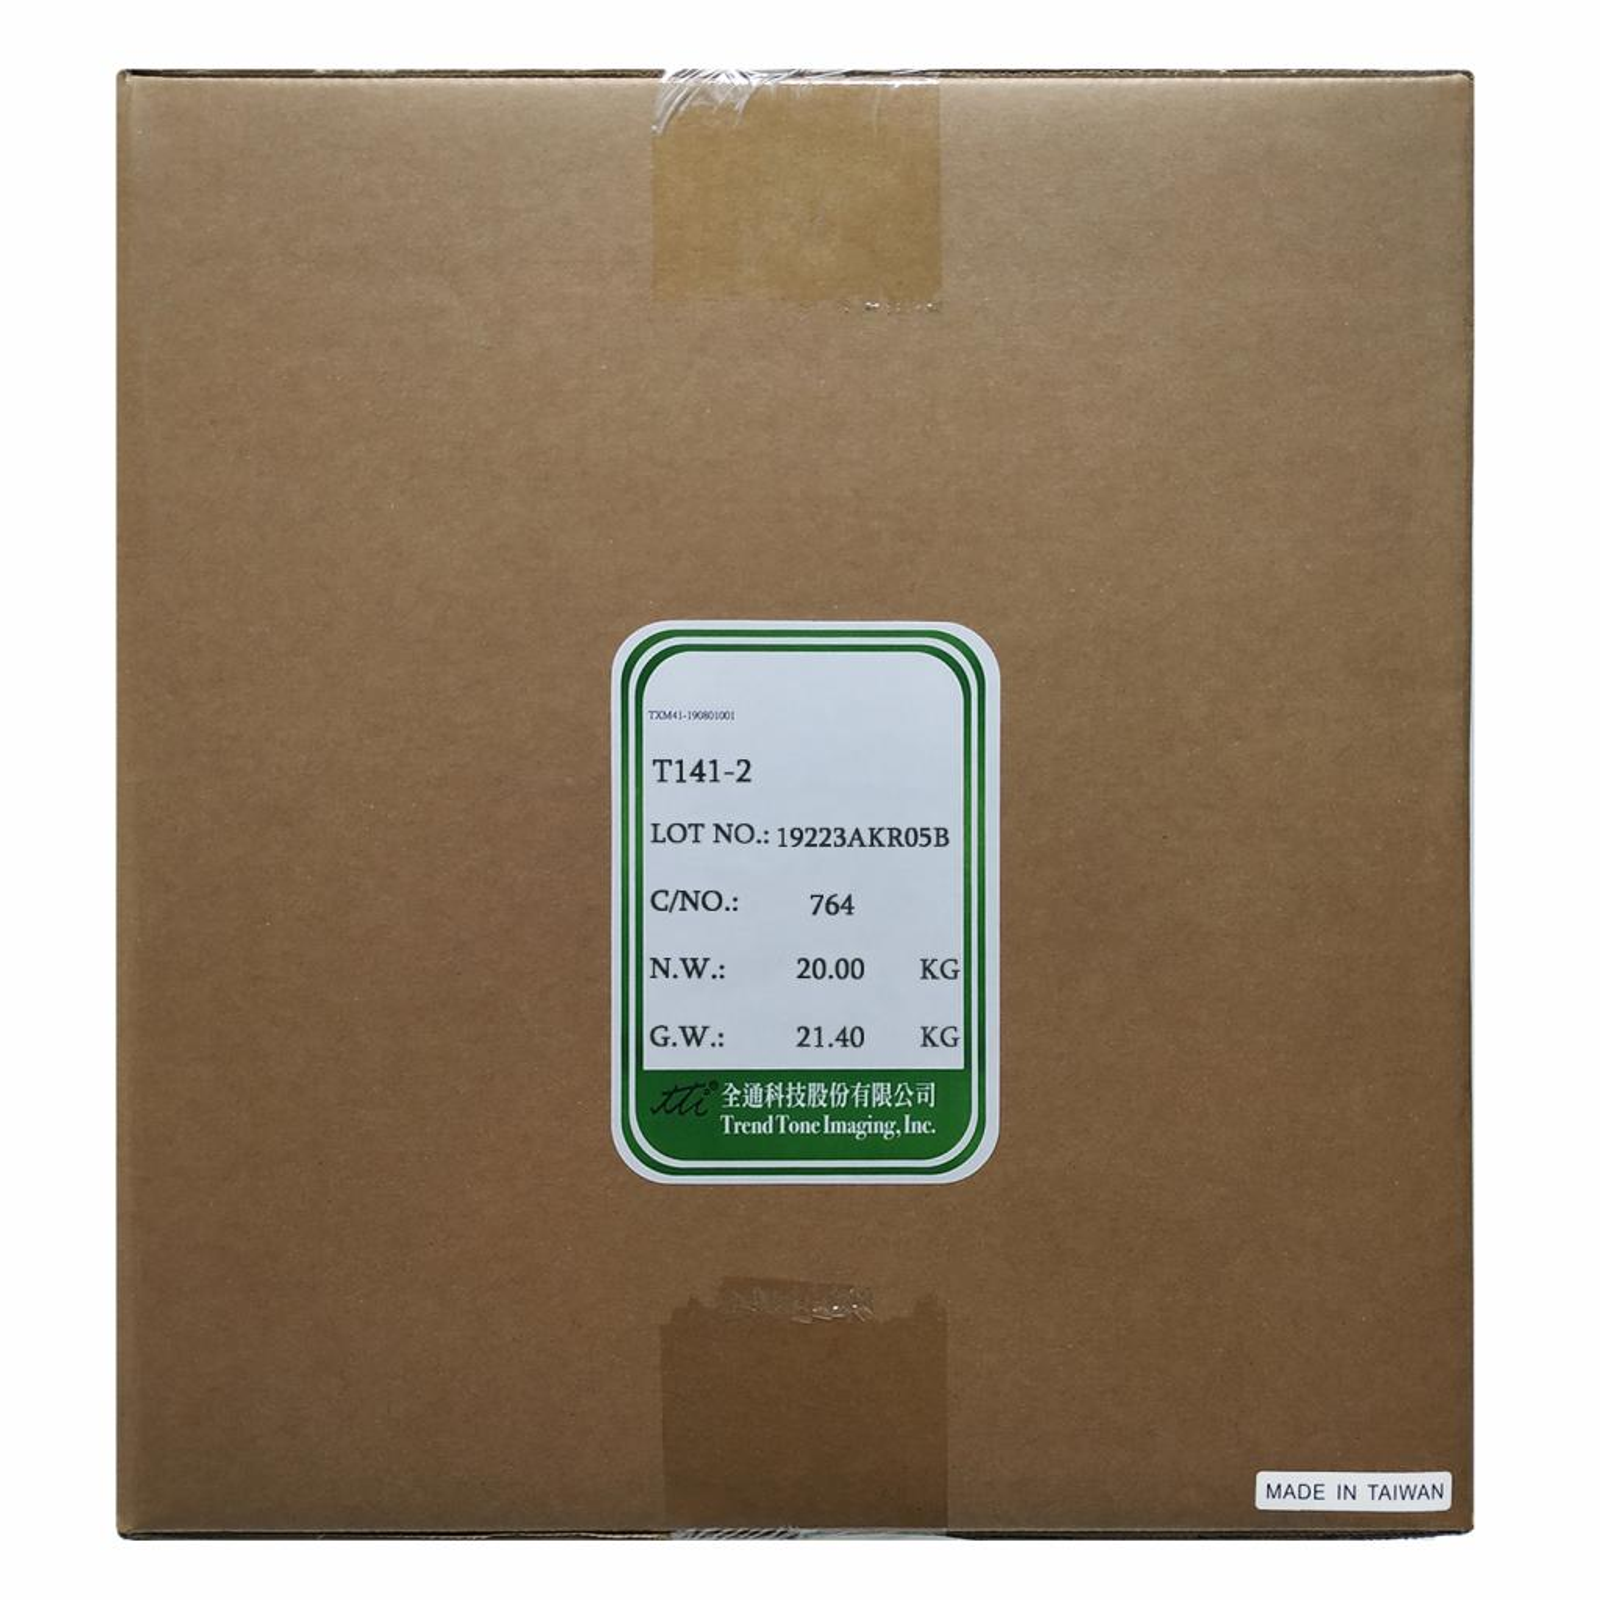 Тонер KYOCERA TK-1115/TK-1125 2x10кг TTI (TSM-141-2-20)